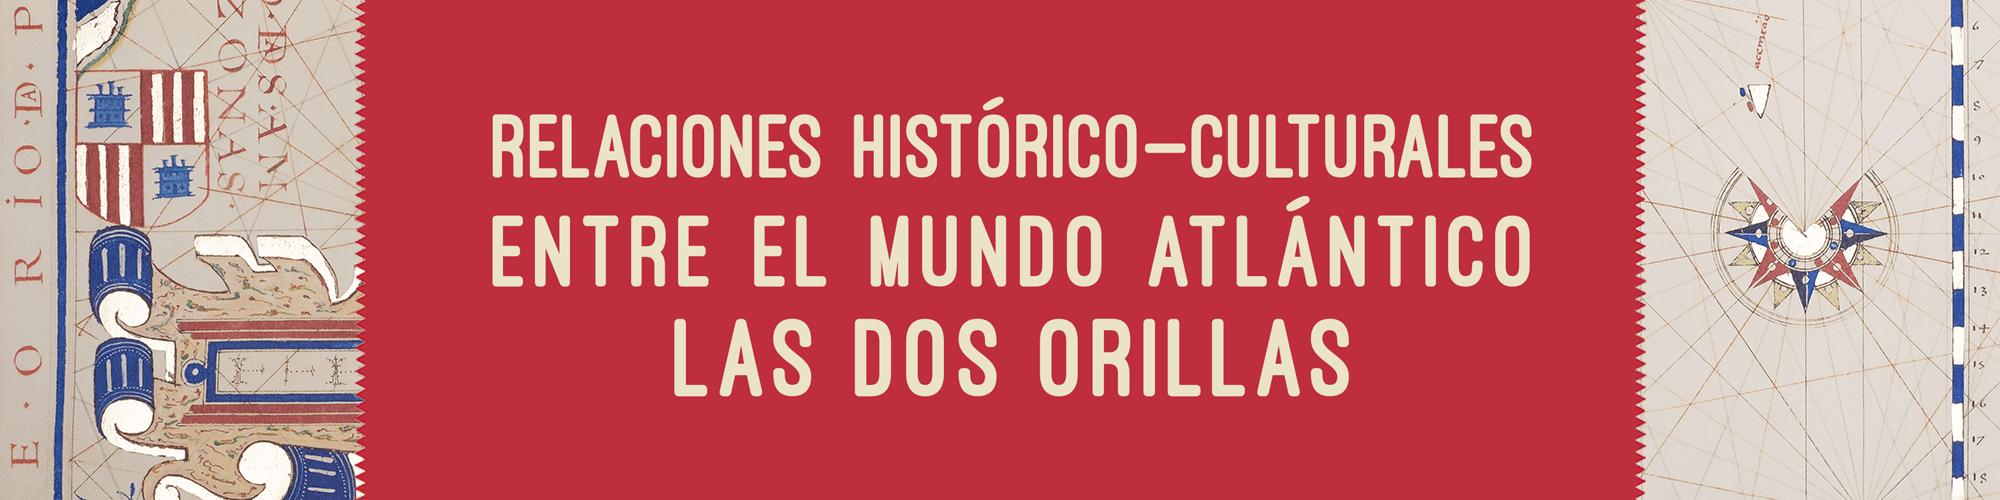 Lema del XXIII Coloquio de Historia Canario Americana